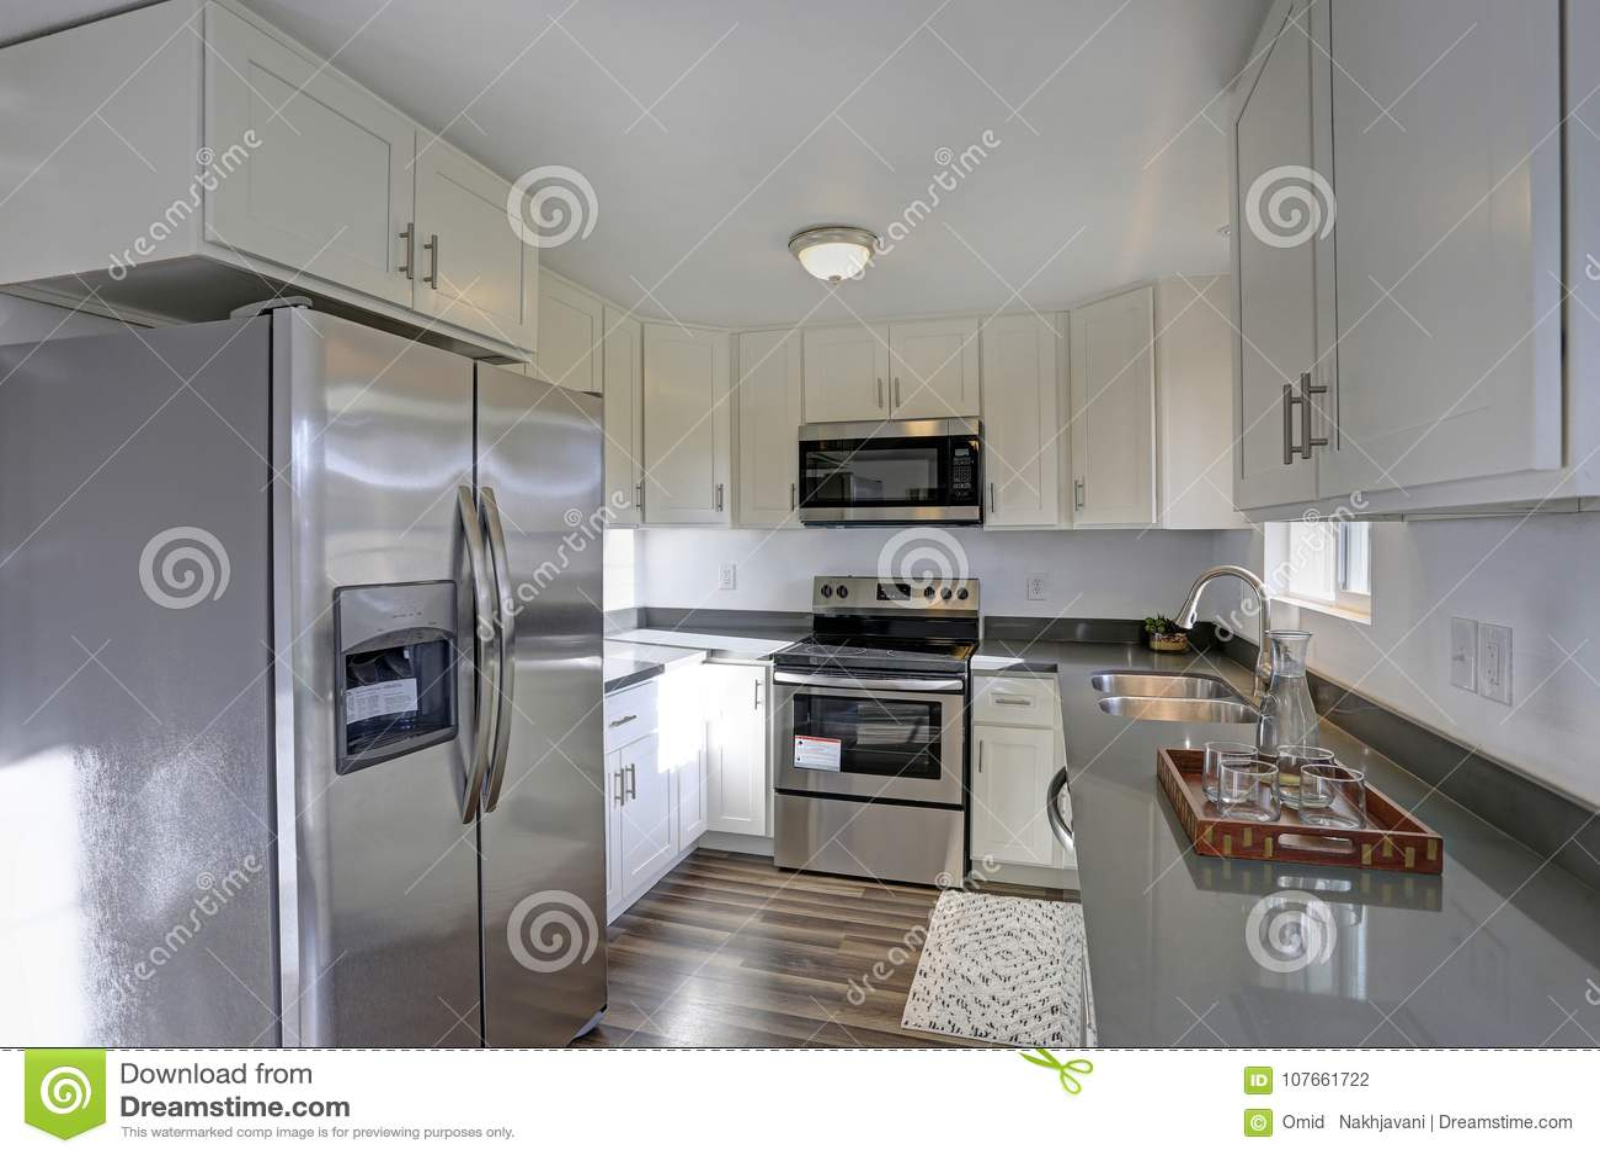 compact kitchens maple kitchen island 点燃被填装的家庭内部特点小紧凑厨房库存照片 图片包括有设计 拱道 点燃有白色内阁和现代不锈钢装置的被填装的家庭内部特点小紧凑厨房